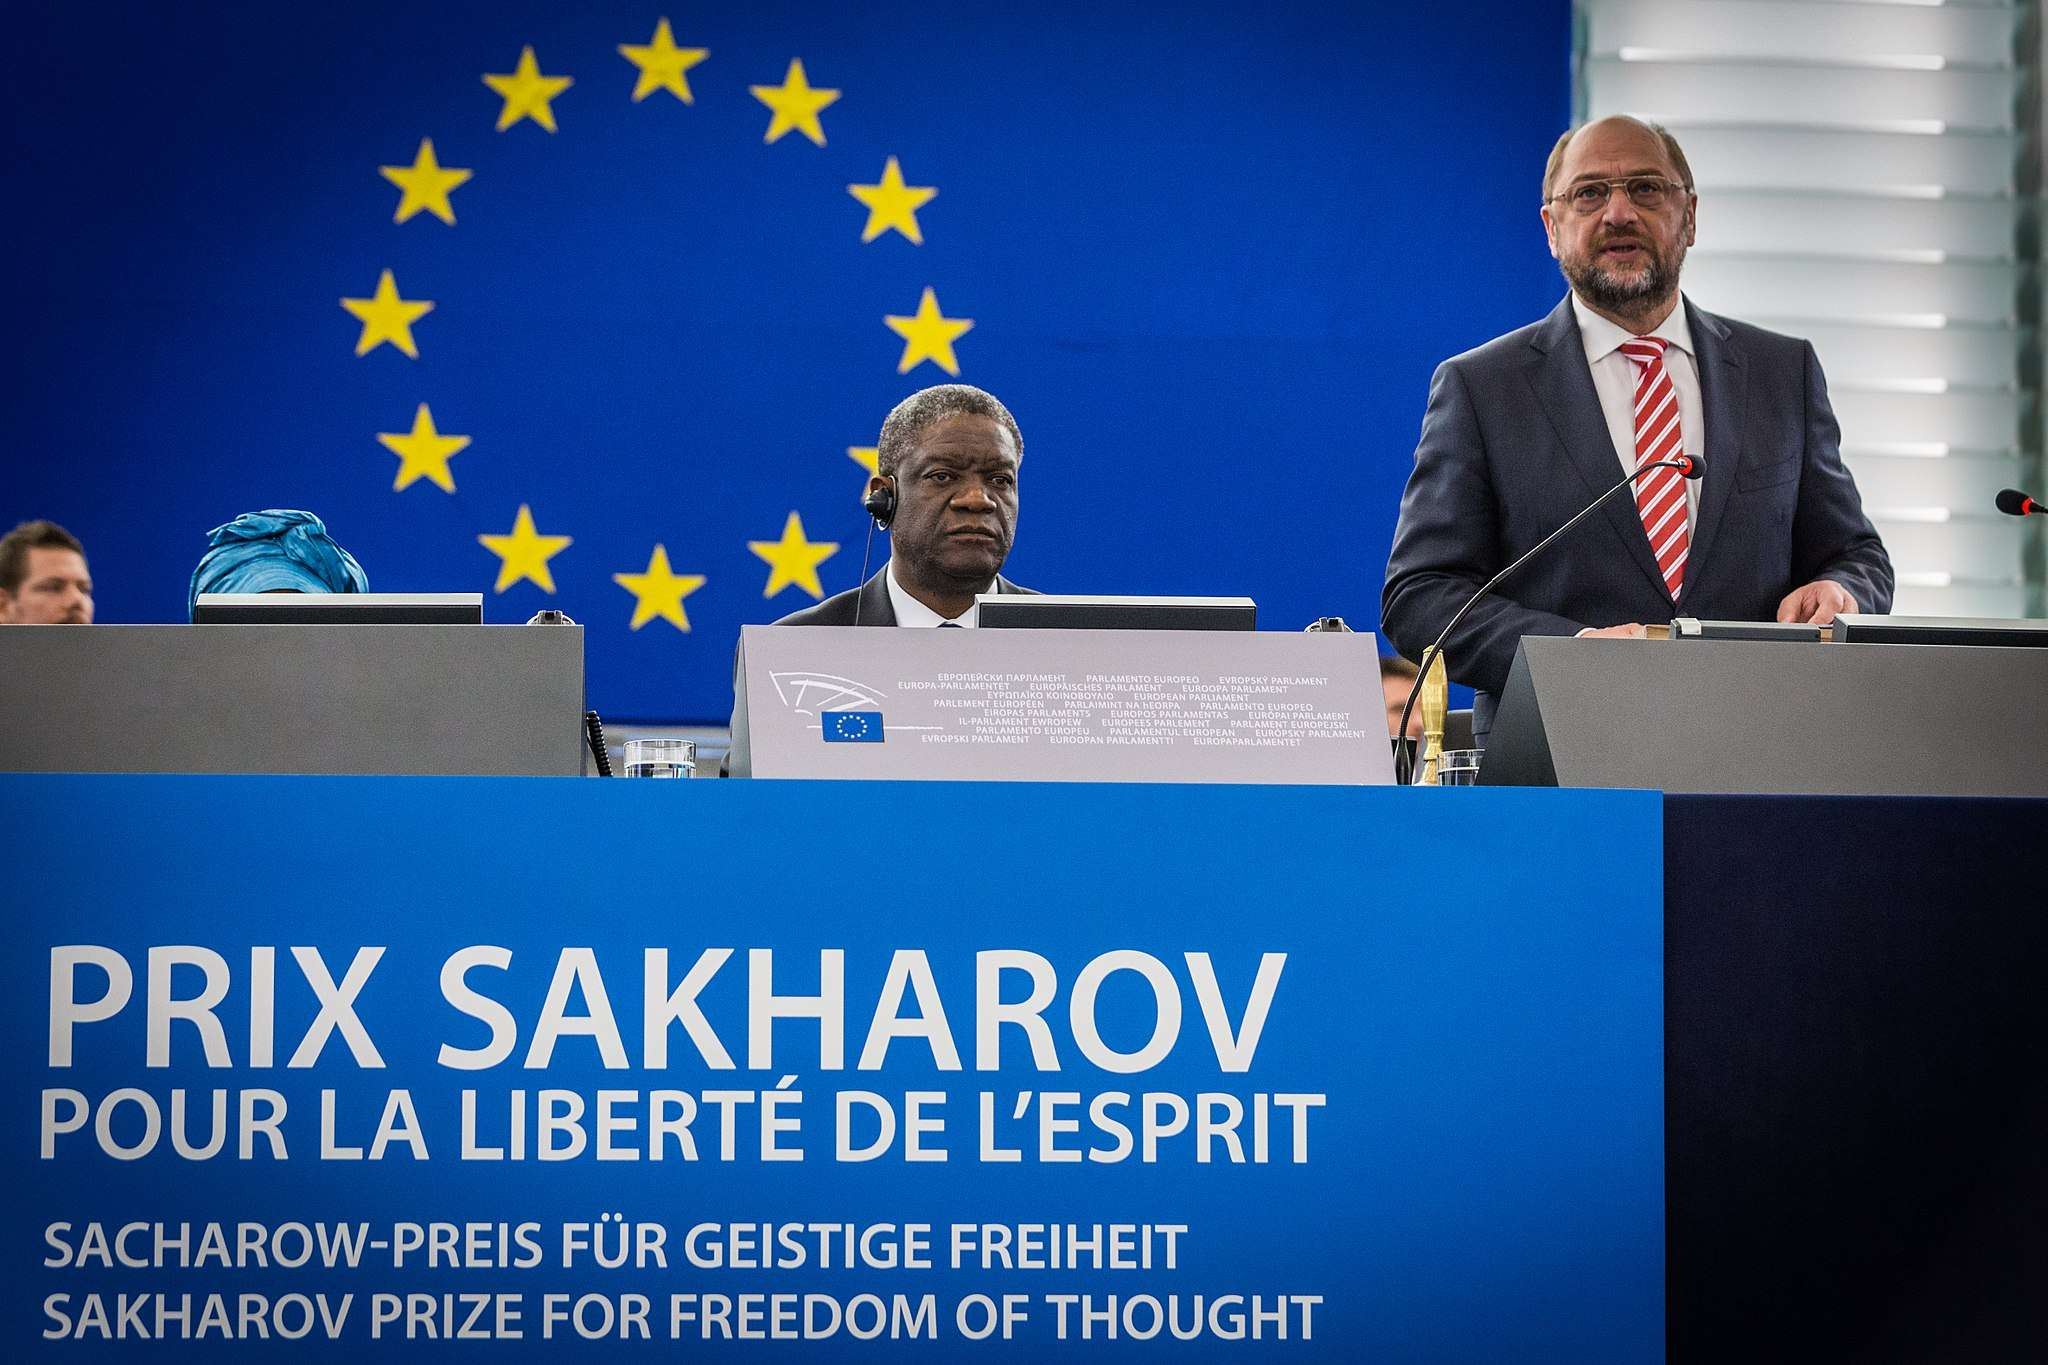 #FactOfTheDay 05/06/2018 – The European Parliament celebrates the 30th anniversary of the Sakharov Prize